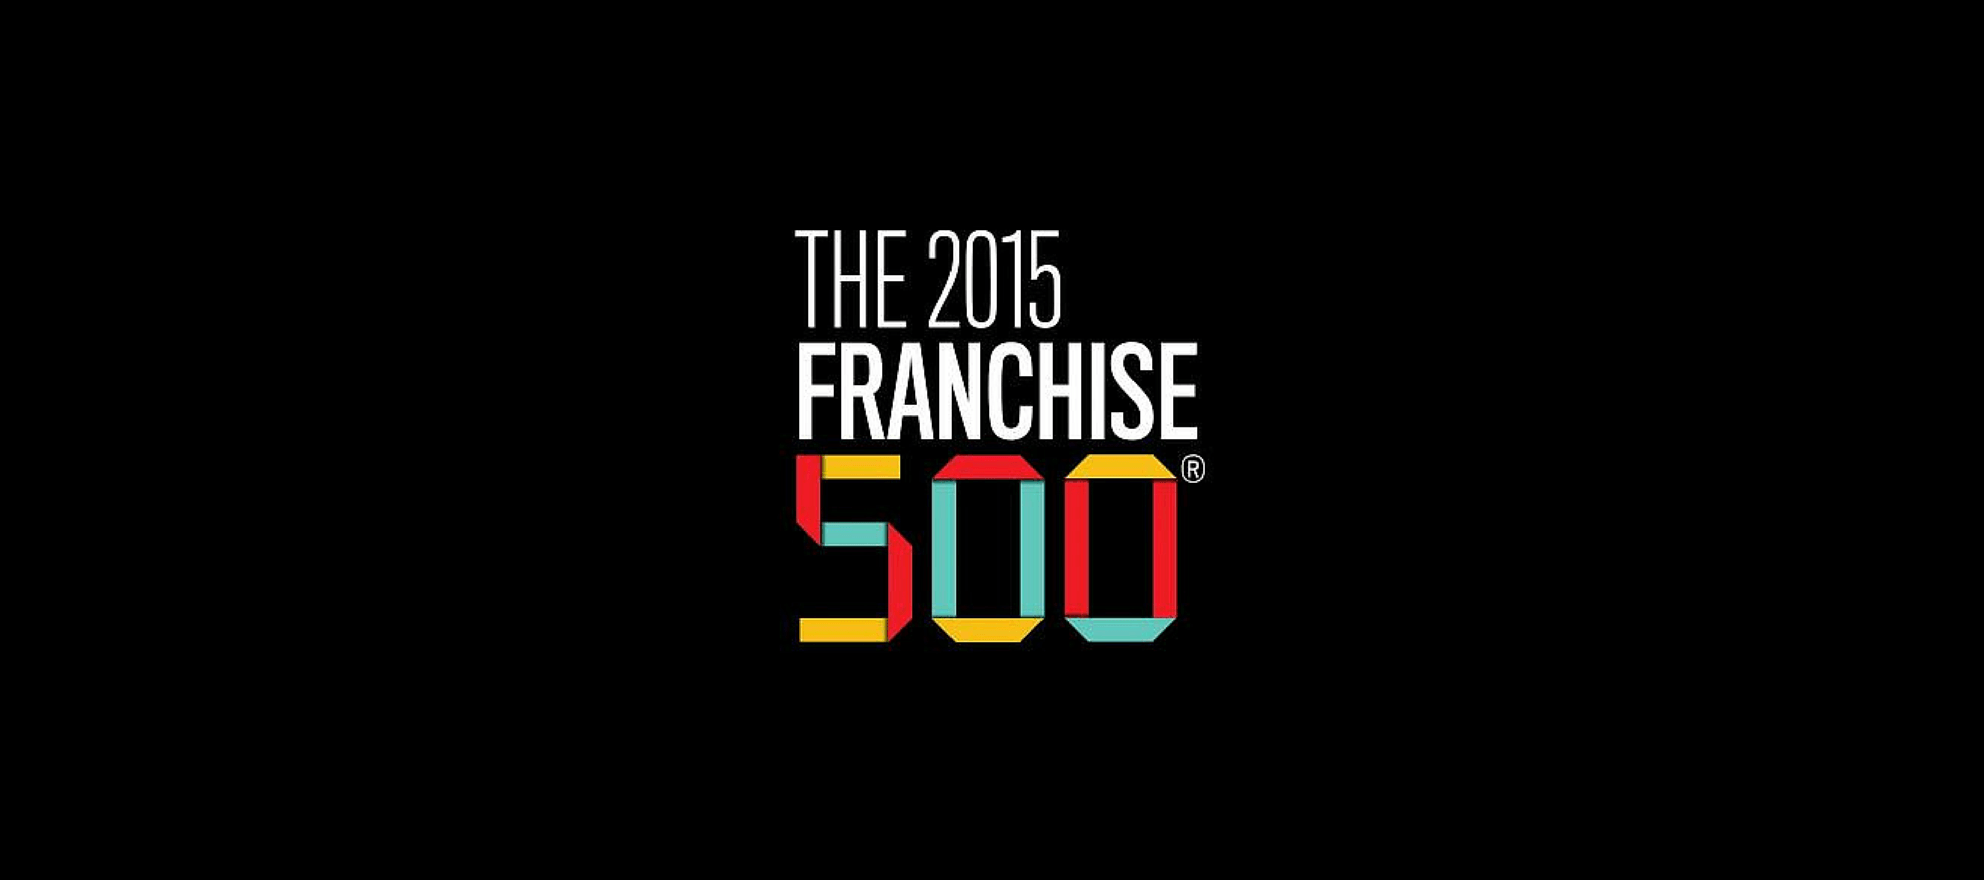 5 real estate companies make Entrepreneur's 'Franchise 500' list